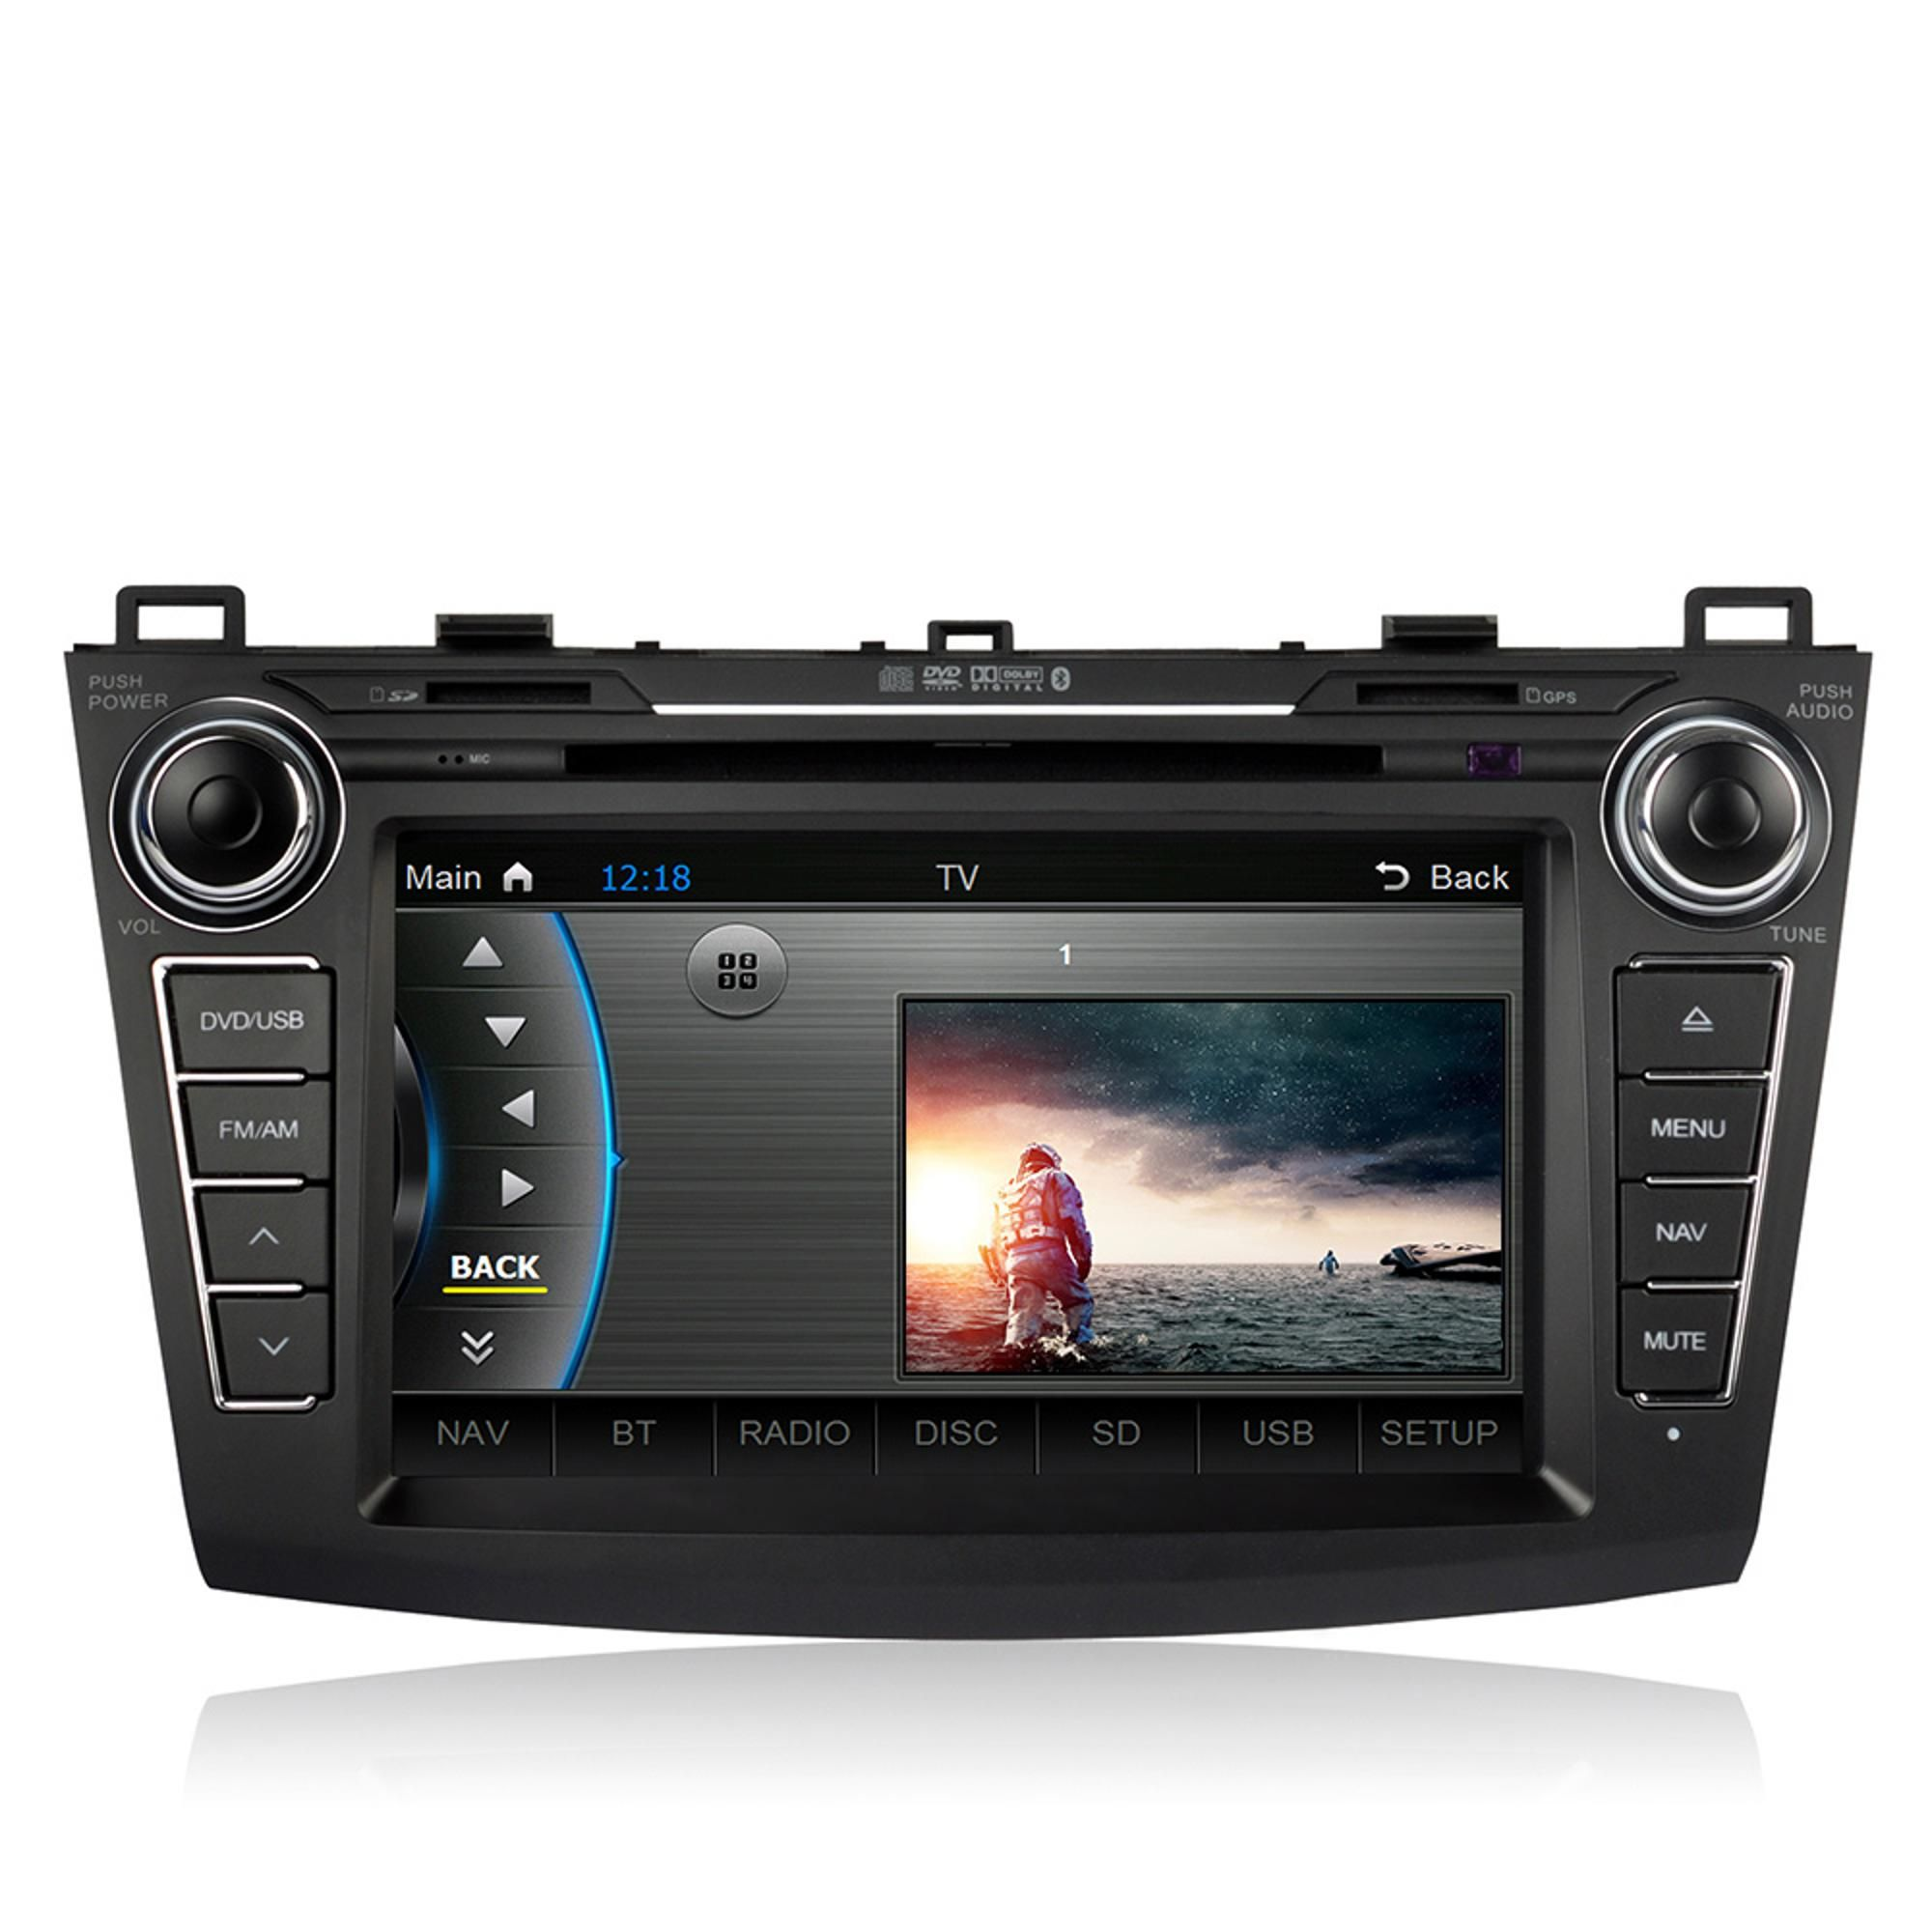 medium resolution of caska 8 inch hd touch screen car in dash dvd player 2 din car pc stereo head unit gps navigation bluetooth radio multimedia system for mazda 3